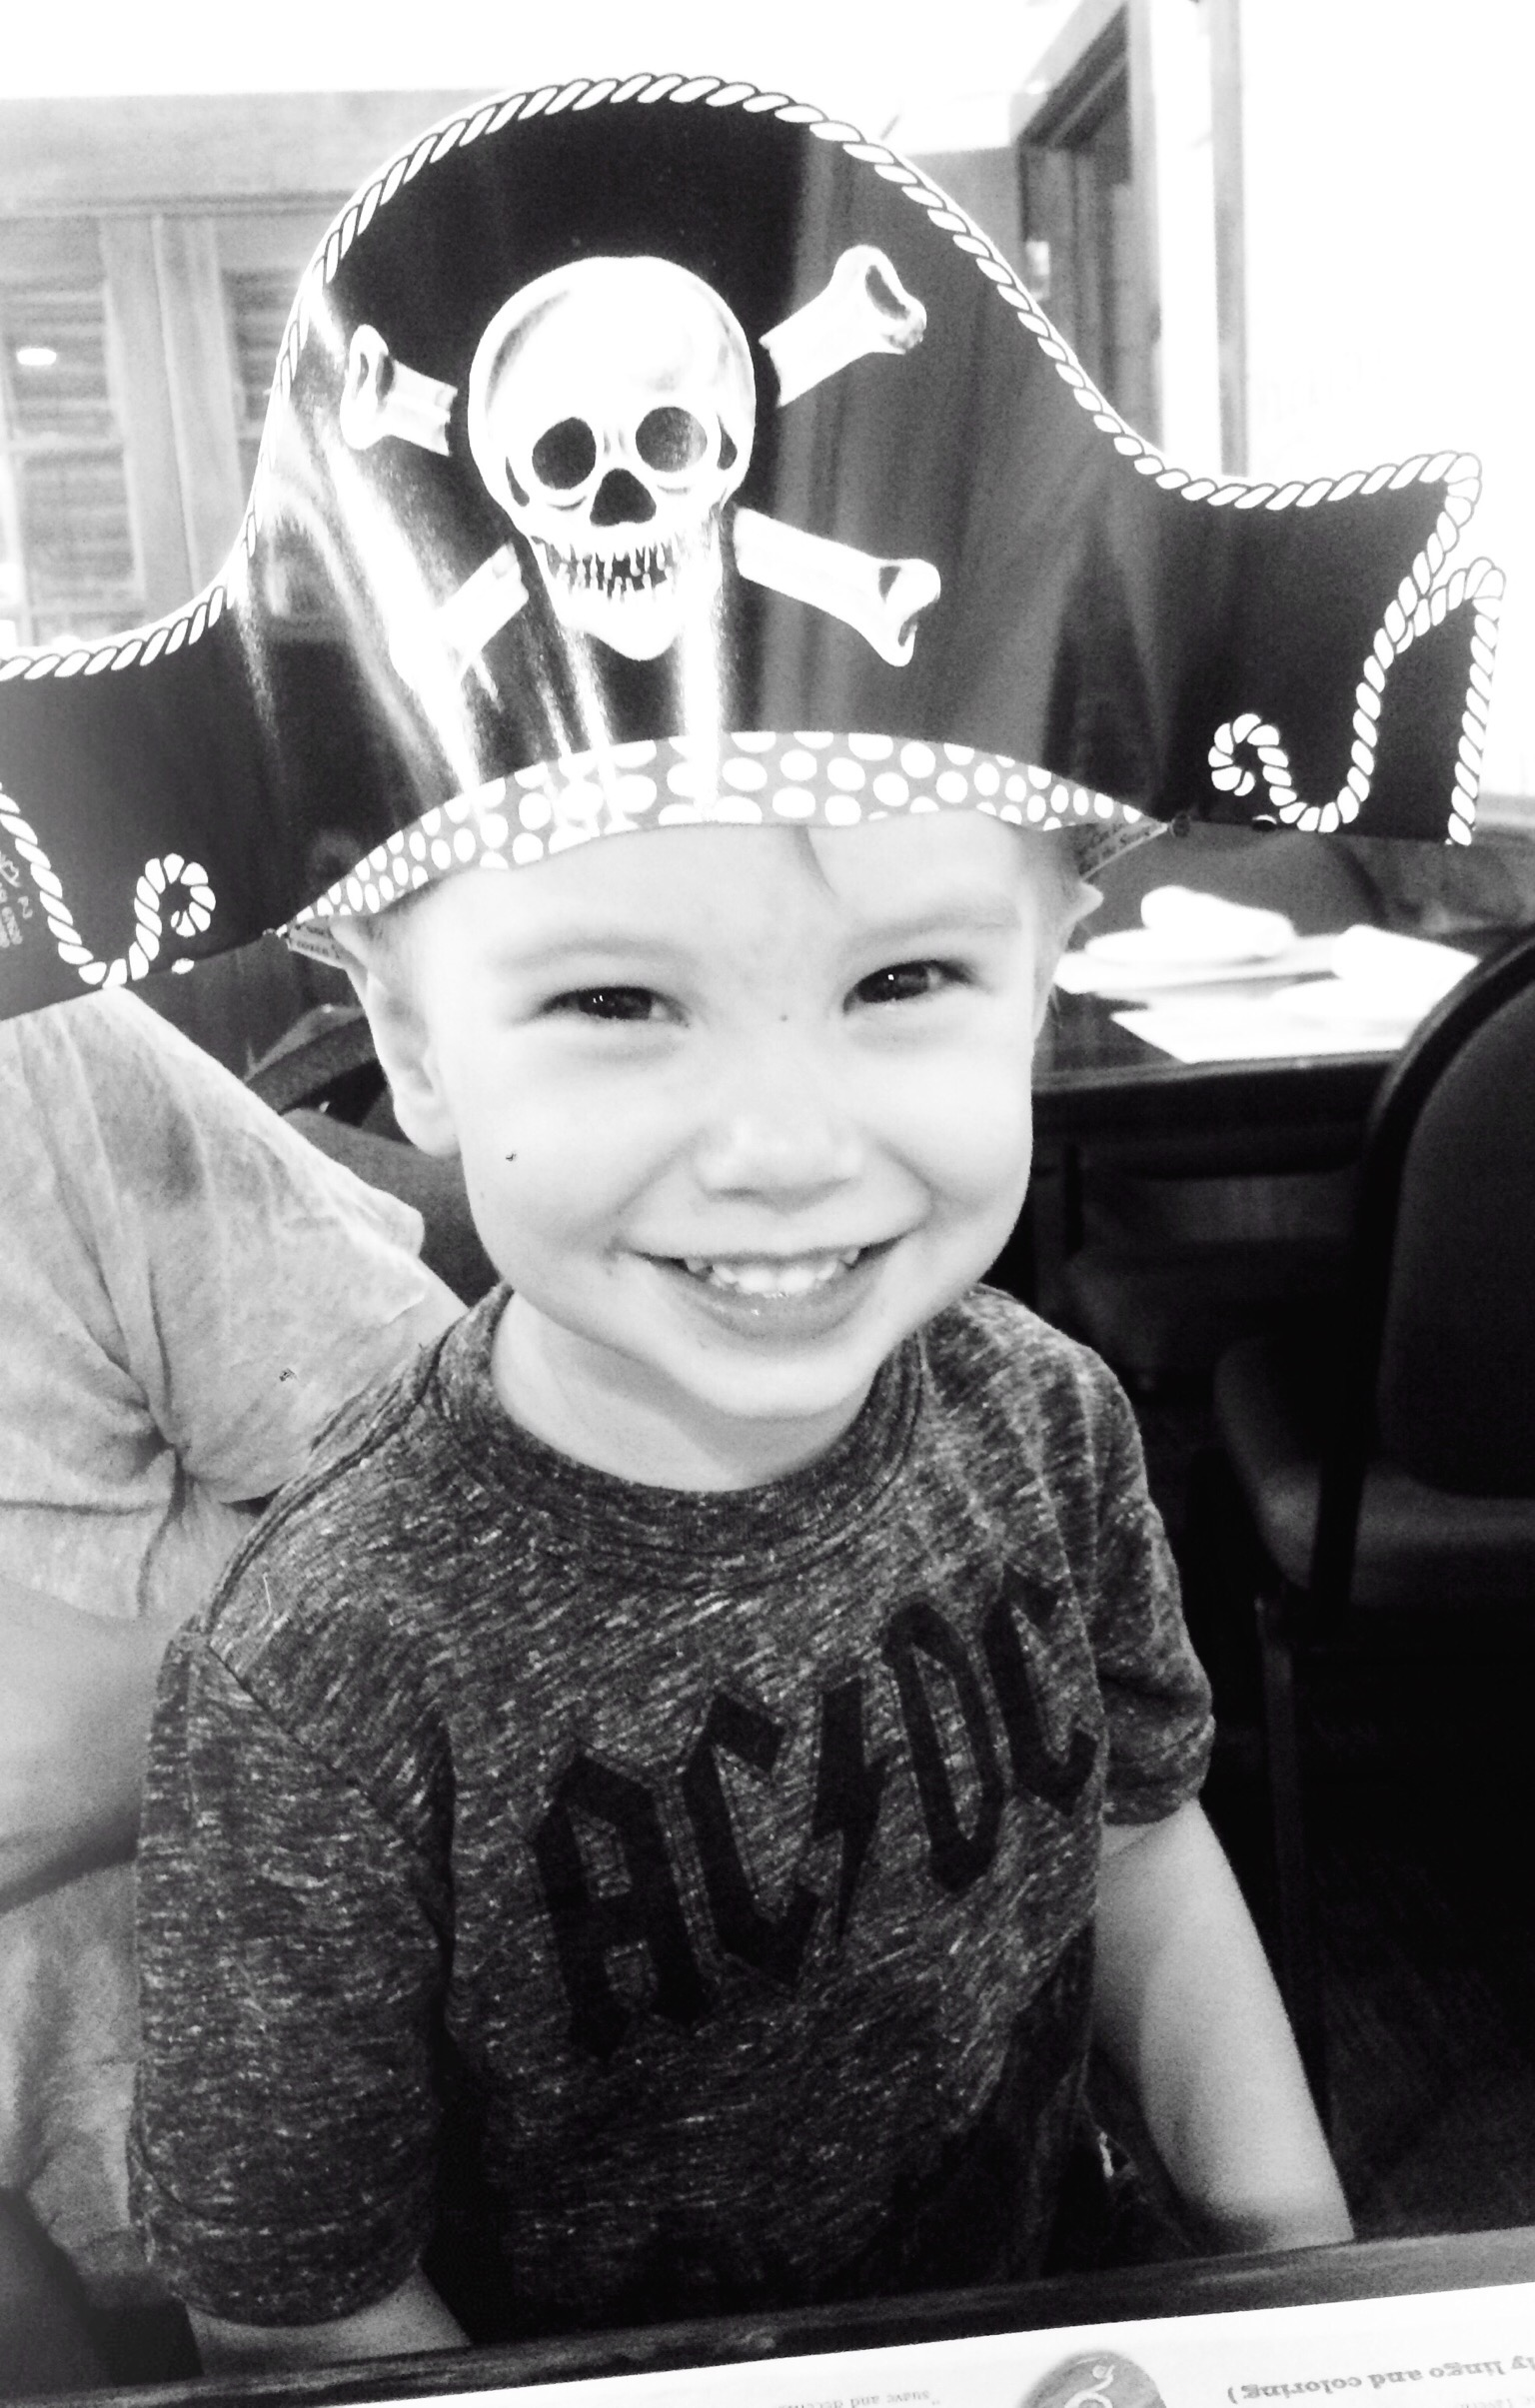 Rhett wearing a pirate hat at The Pirate's House in Savannah, Georgia